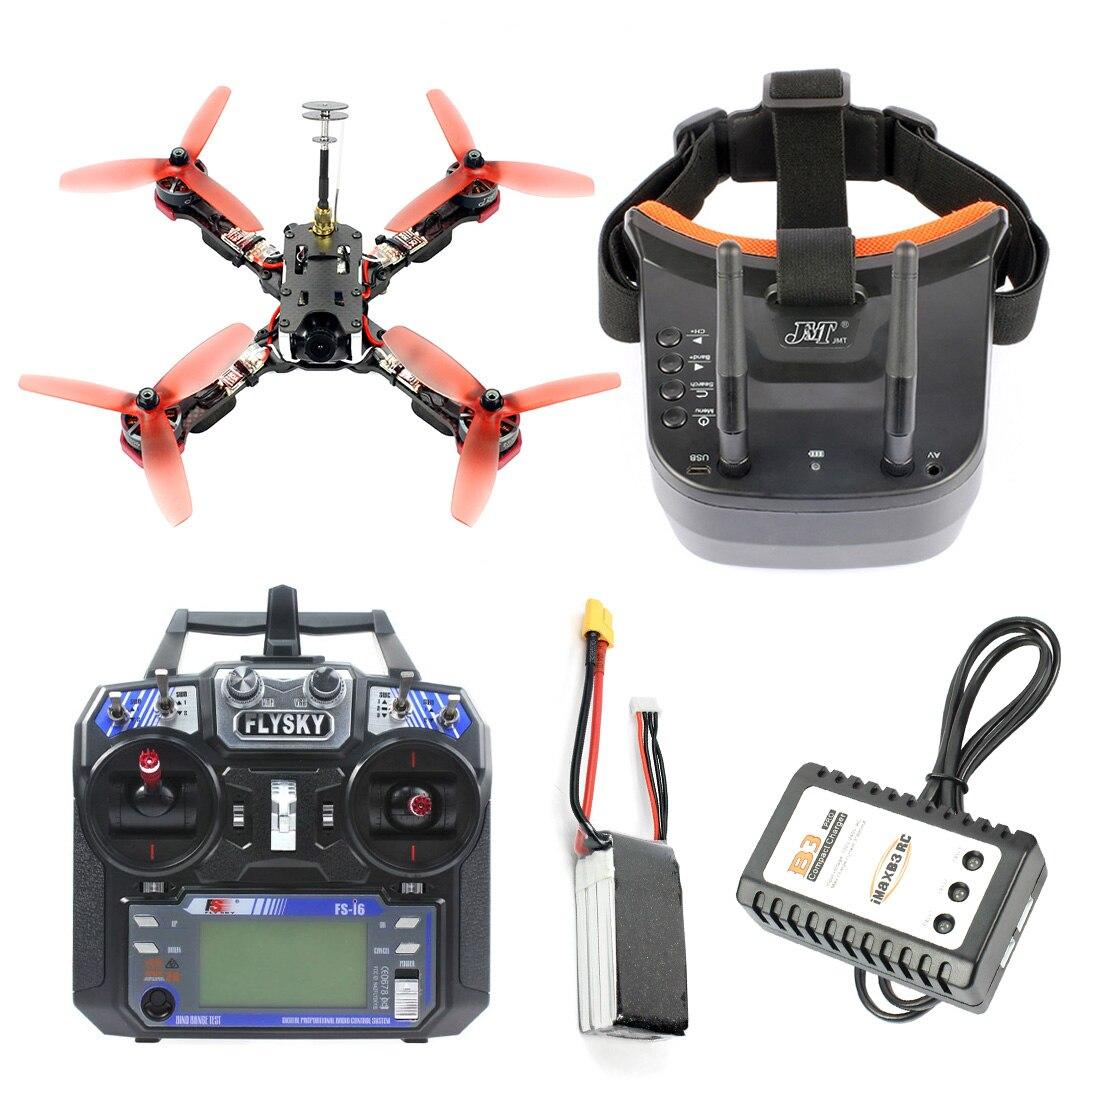 Frog 218mm 2.4G 6CH RC Racer Drone RTF Betaflight F4 Pro V2 BLHeli-s 30A 5.8G 25/200/400mW VTX Mini 700TVL Camera FPV Quadcopter